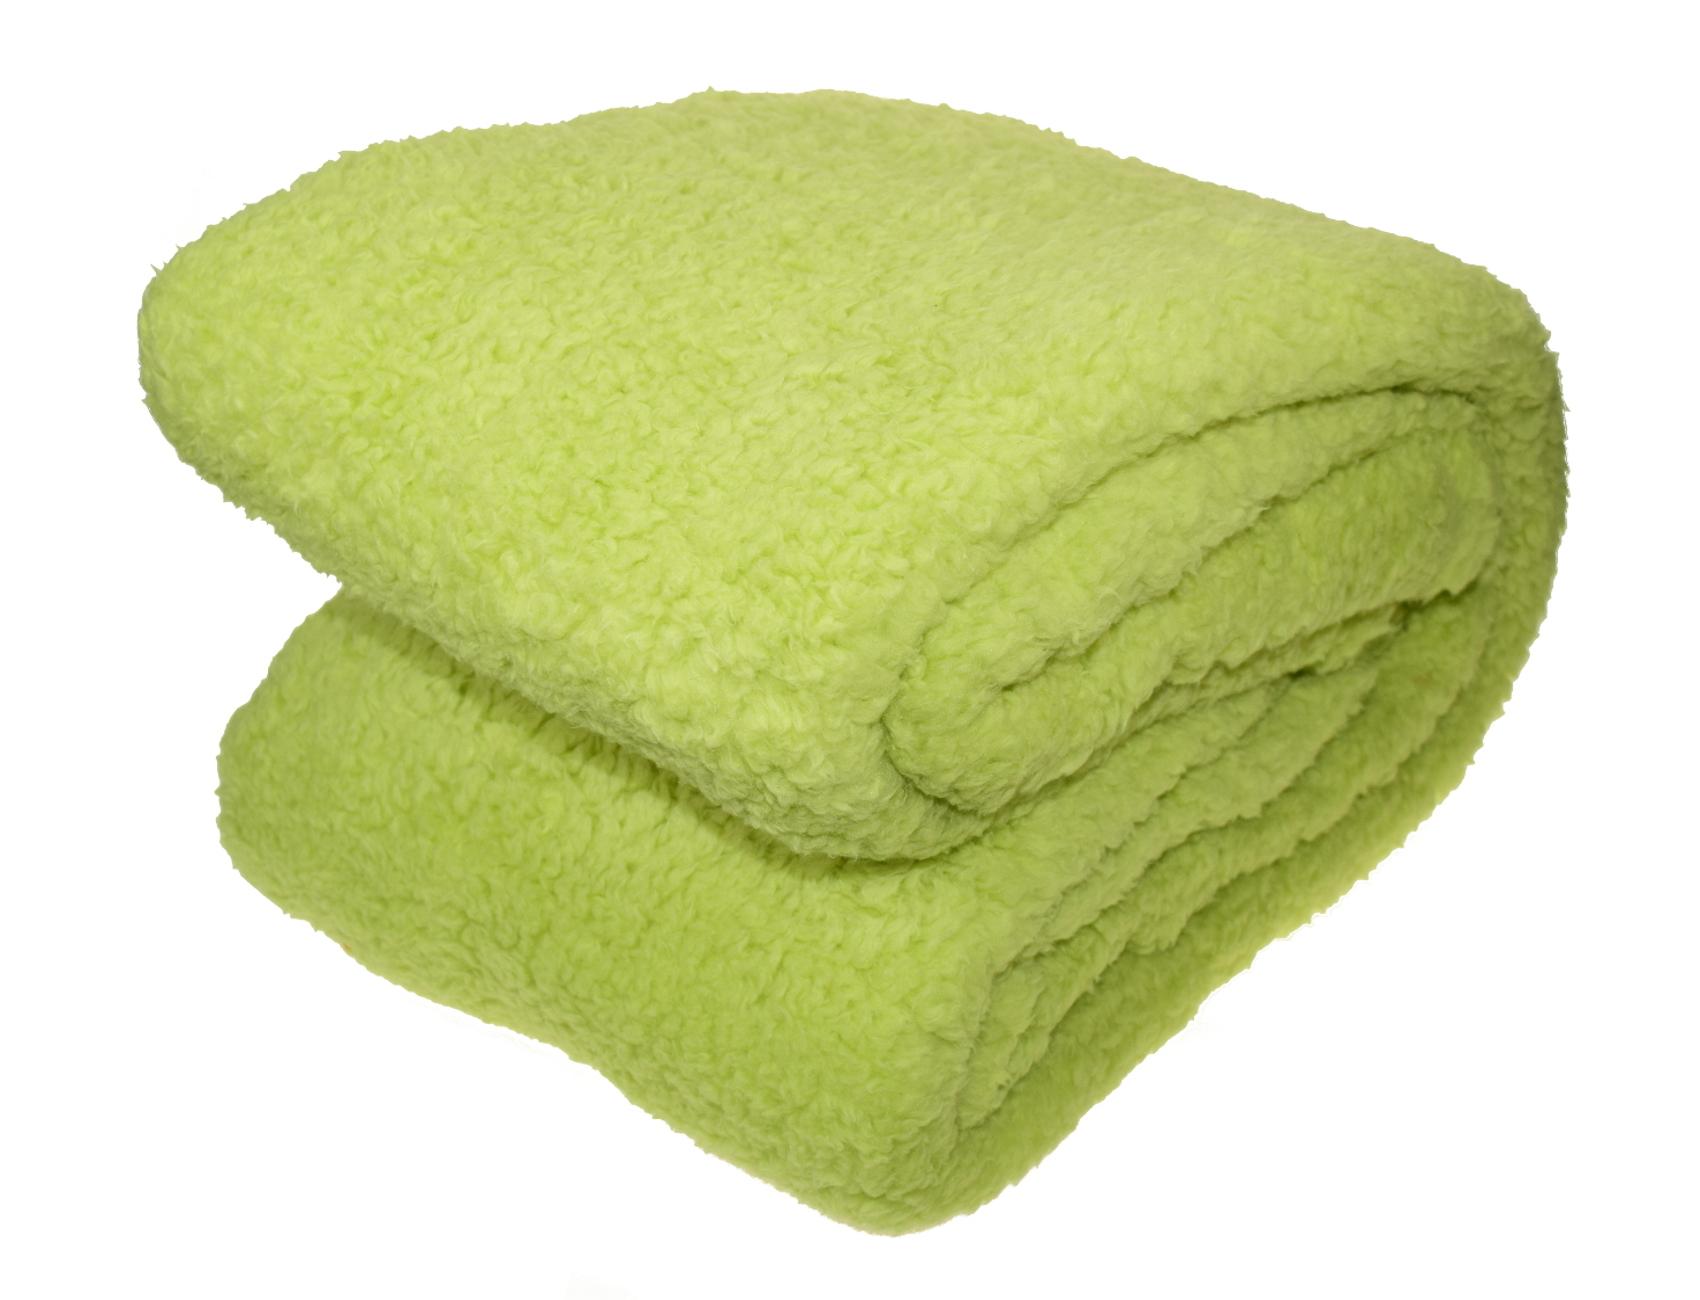 Super Soft Teddy Fleece Blanket Cosy Sofa Bed Luxury Fleecy Throw 130cm X 180cm Ebay